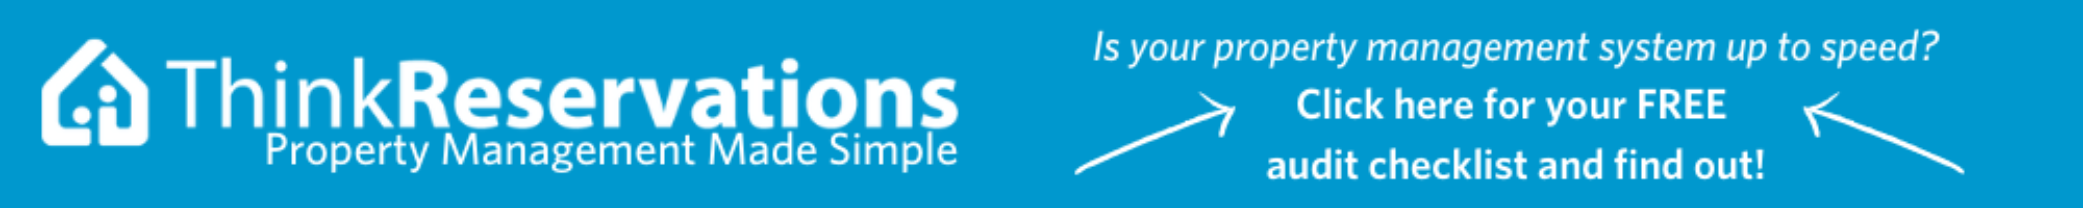 ThinkReservations Banner Ad